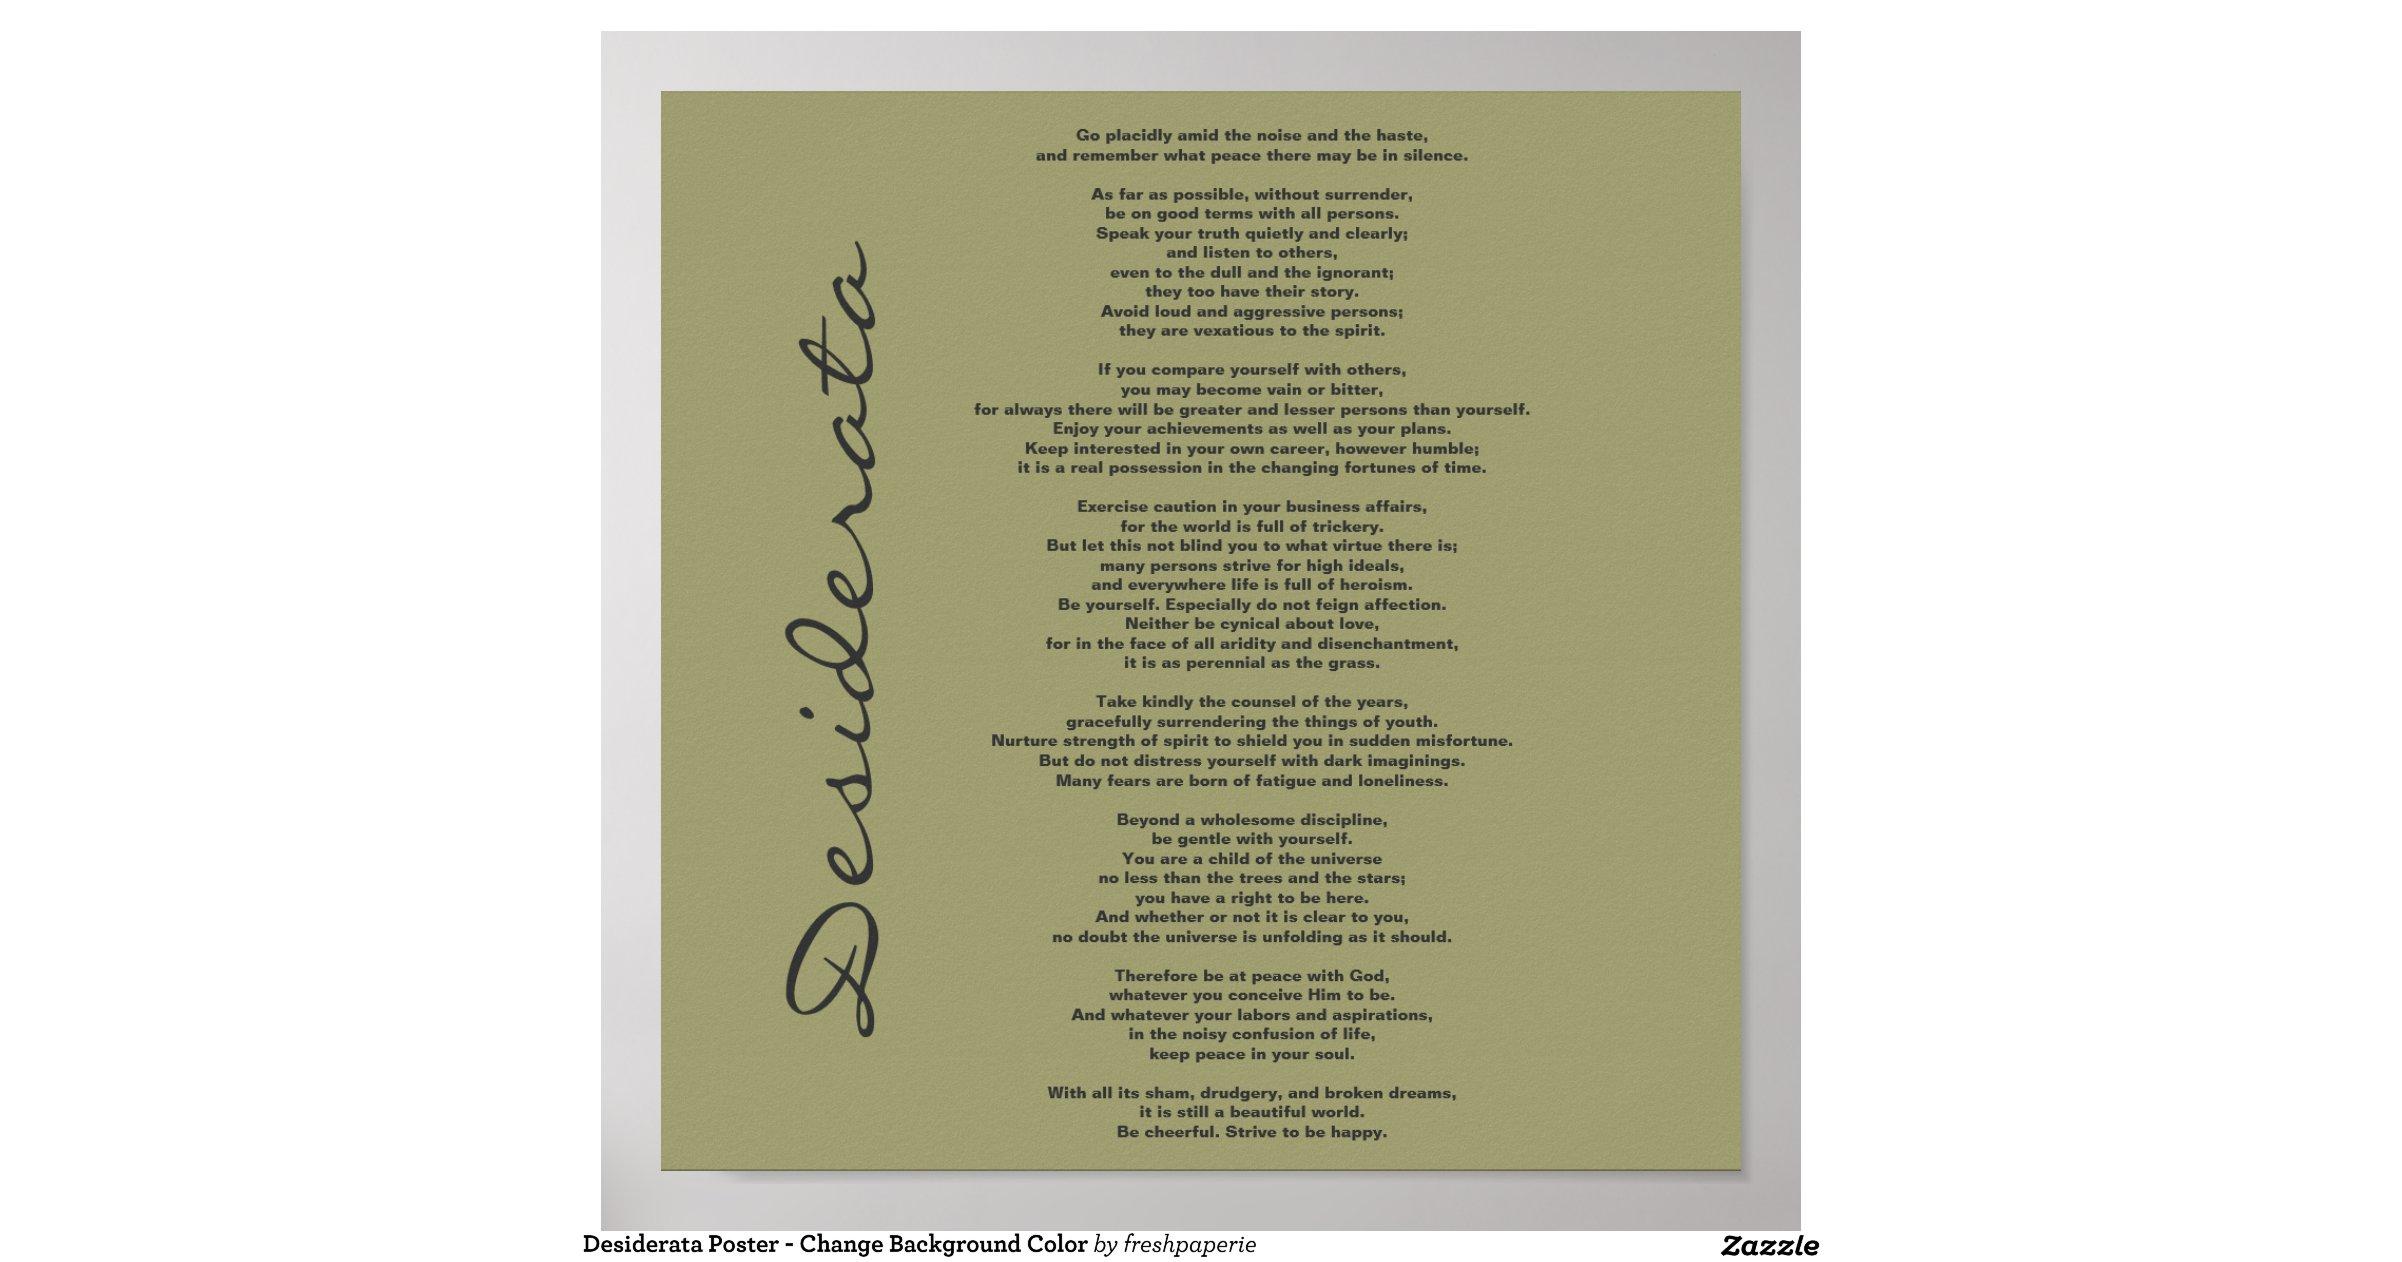 desiderata_poster_change_background_color ...